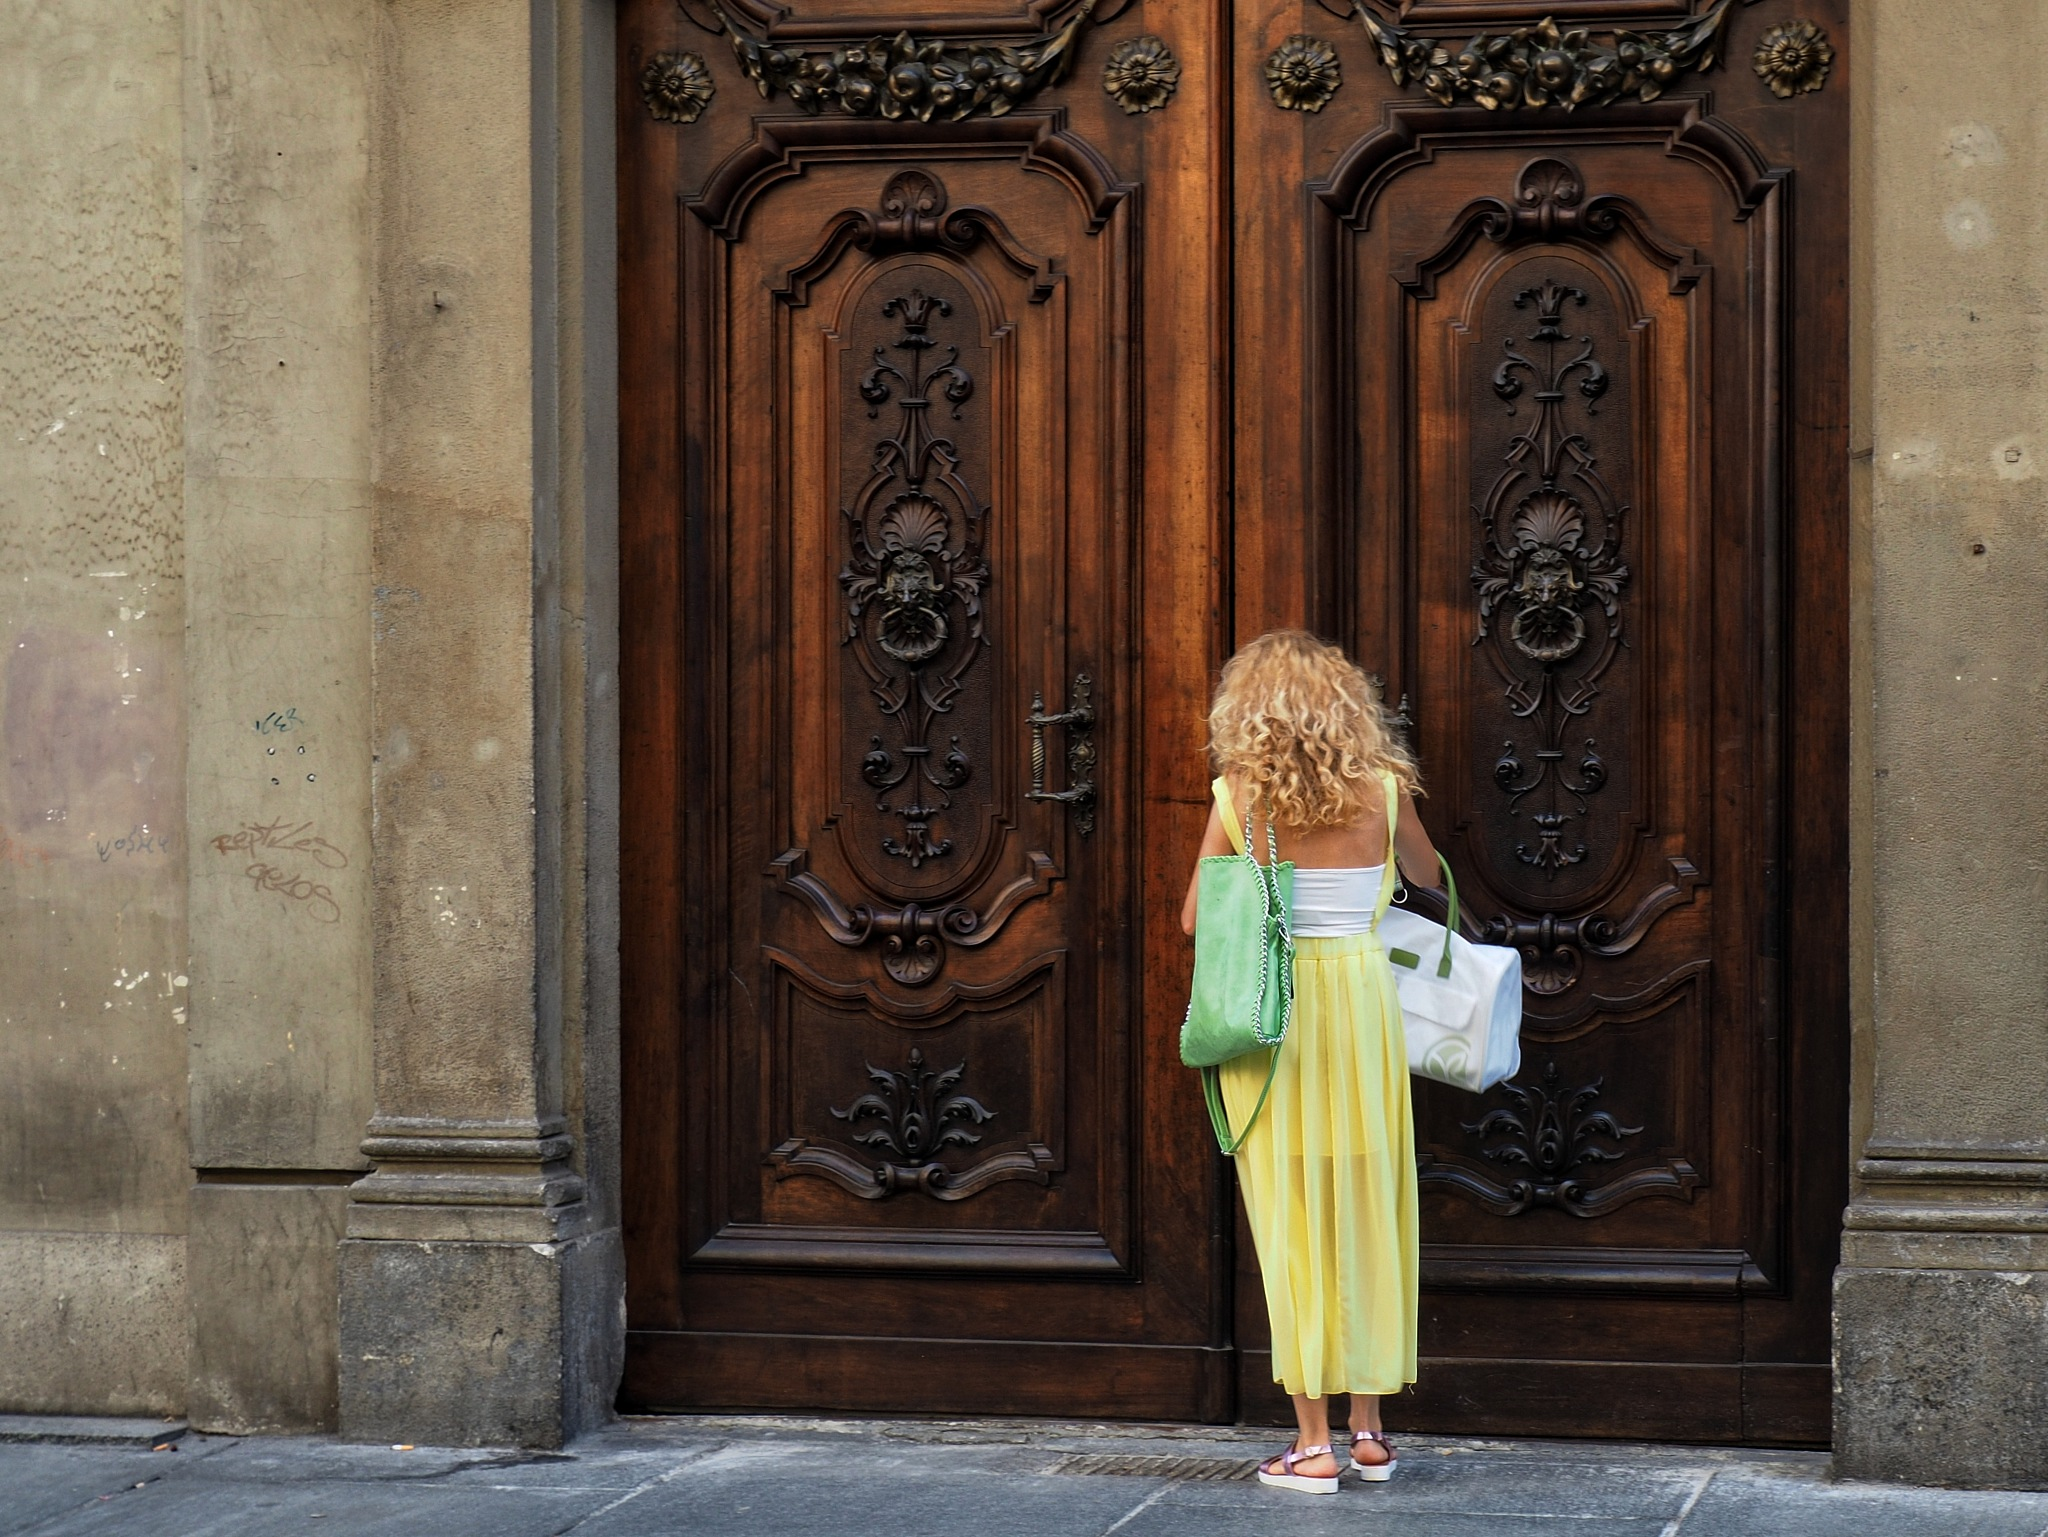 Closed doors #3 by Philip S.